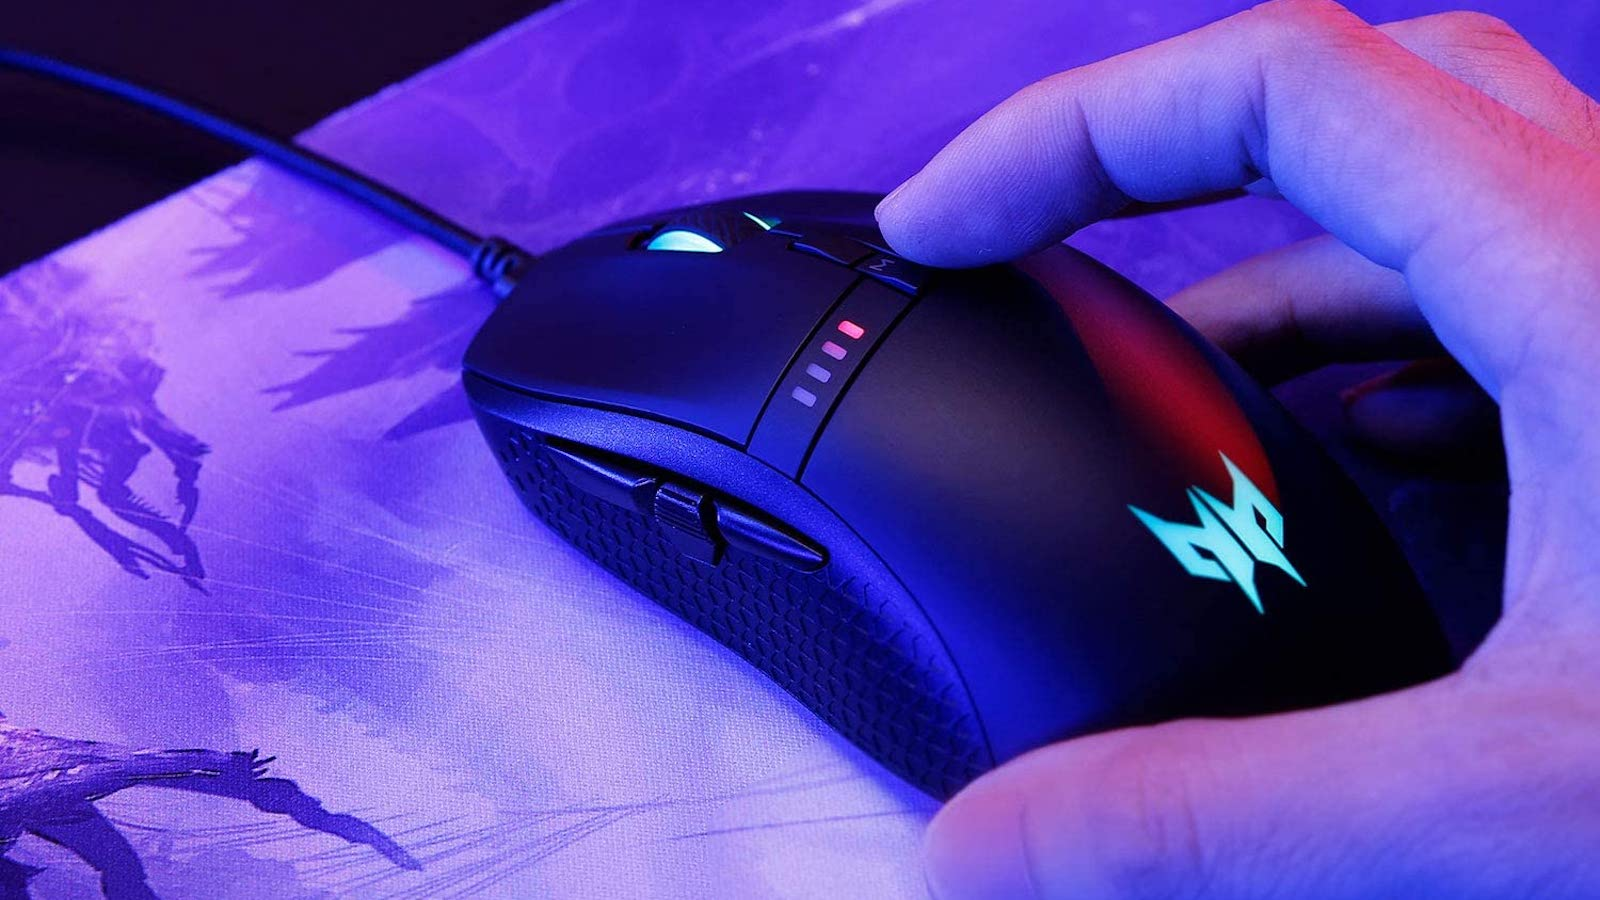 Acer Predator Cestus 350 Gaming Mouse